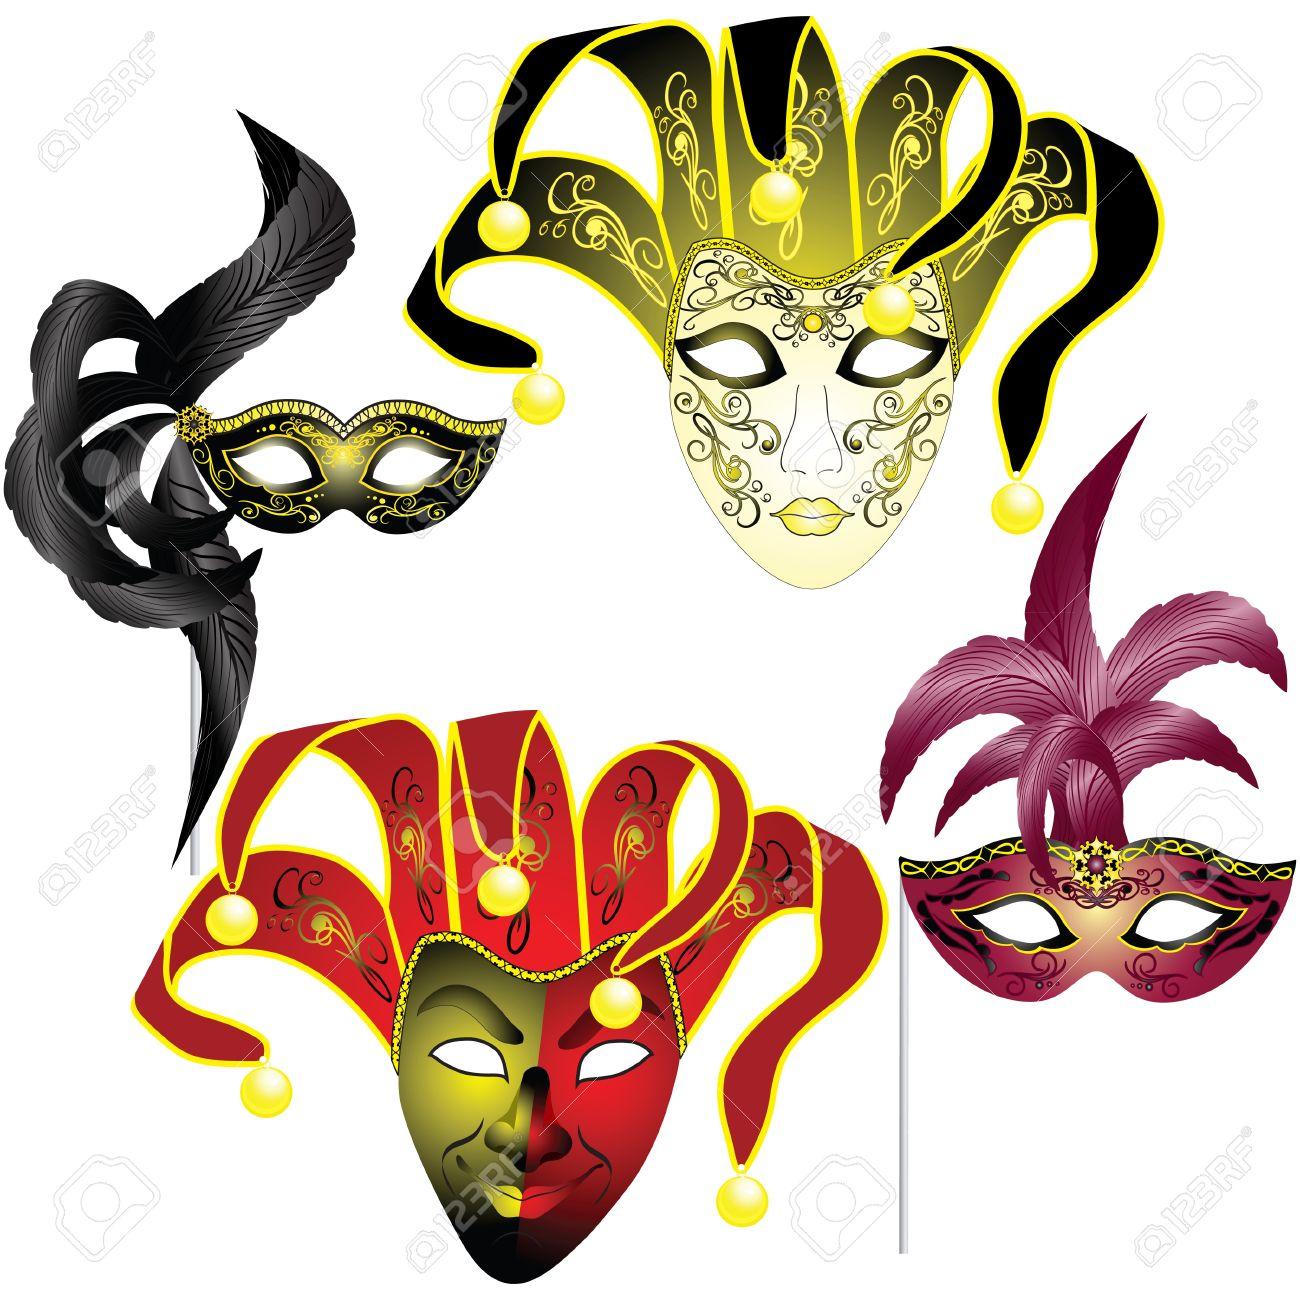 venetian mask royalty free cliparts vectors and stock illustration rh 123rf com gold masquerade mask clipart masquerade mask clipart black and white